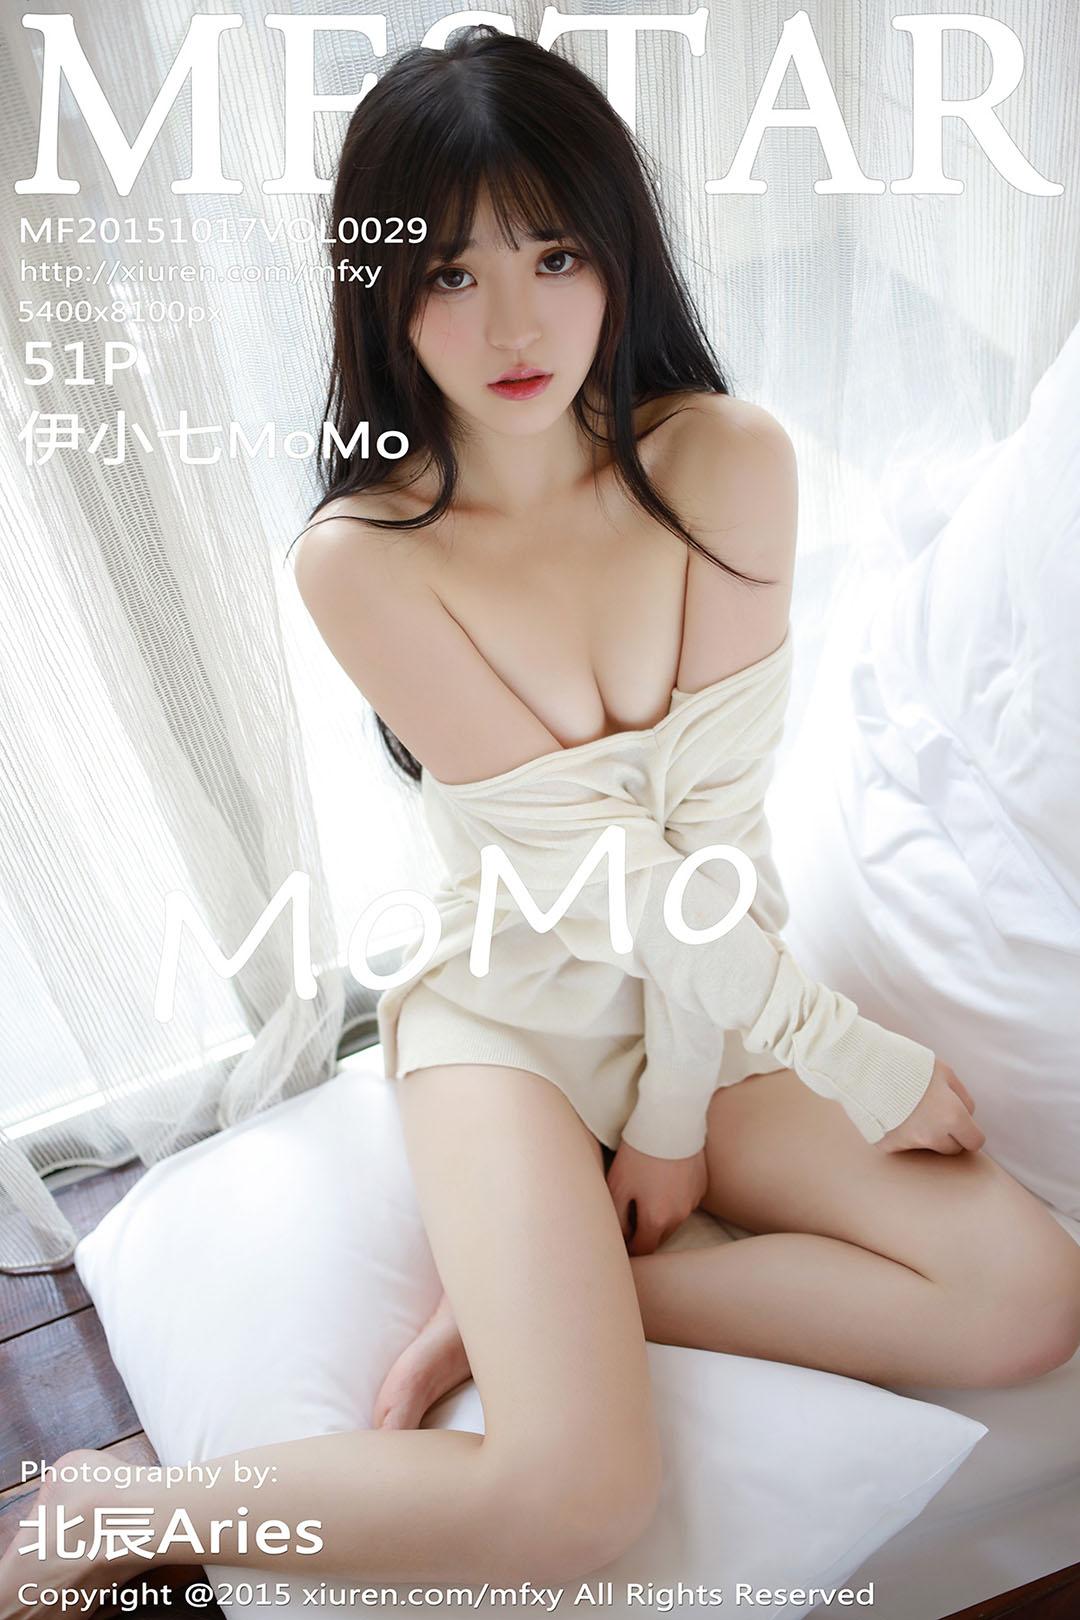 MFStar 029